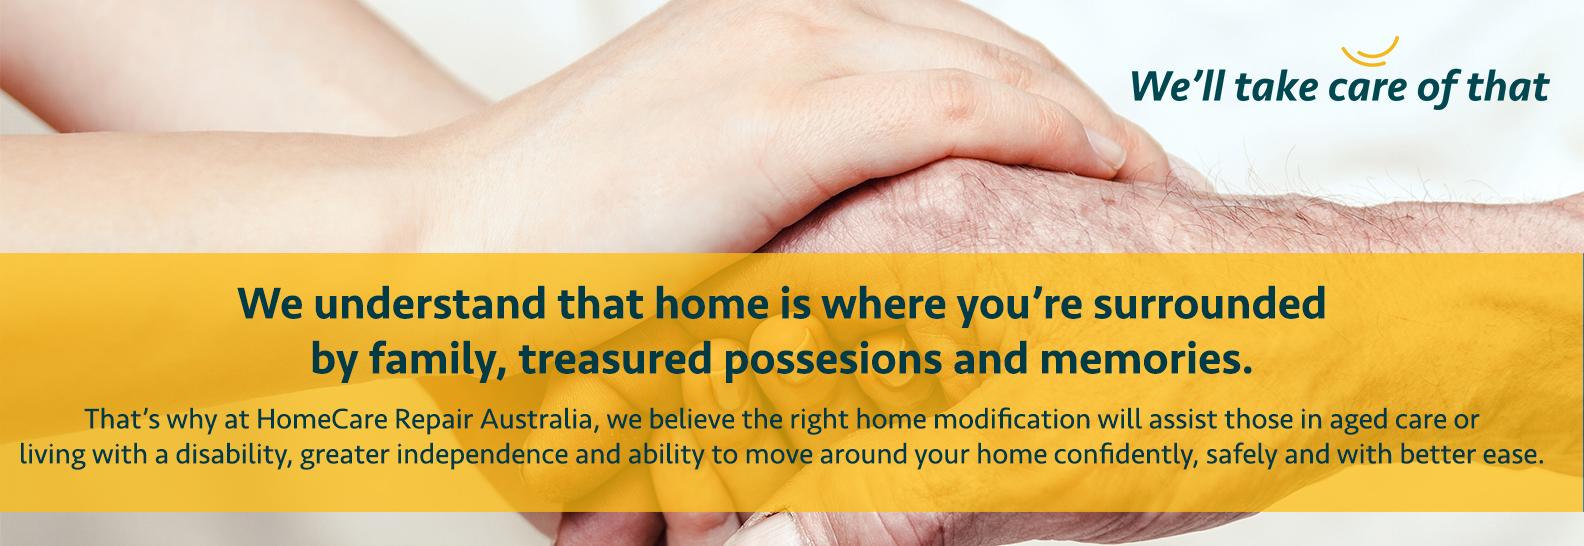 HomeCare Repair Australia